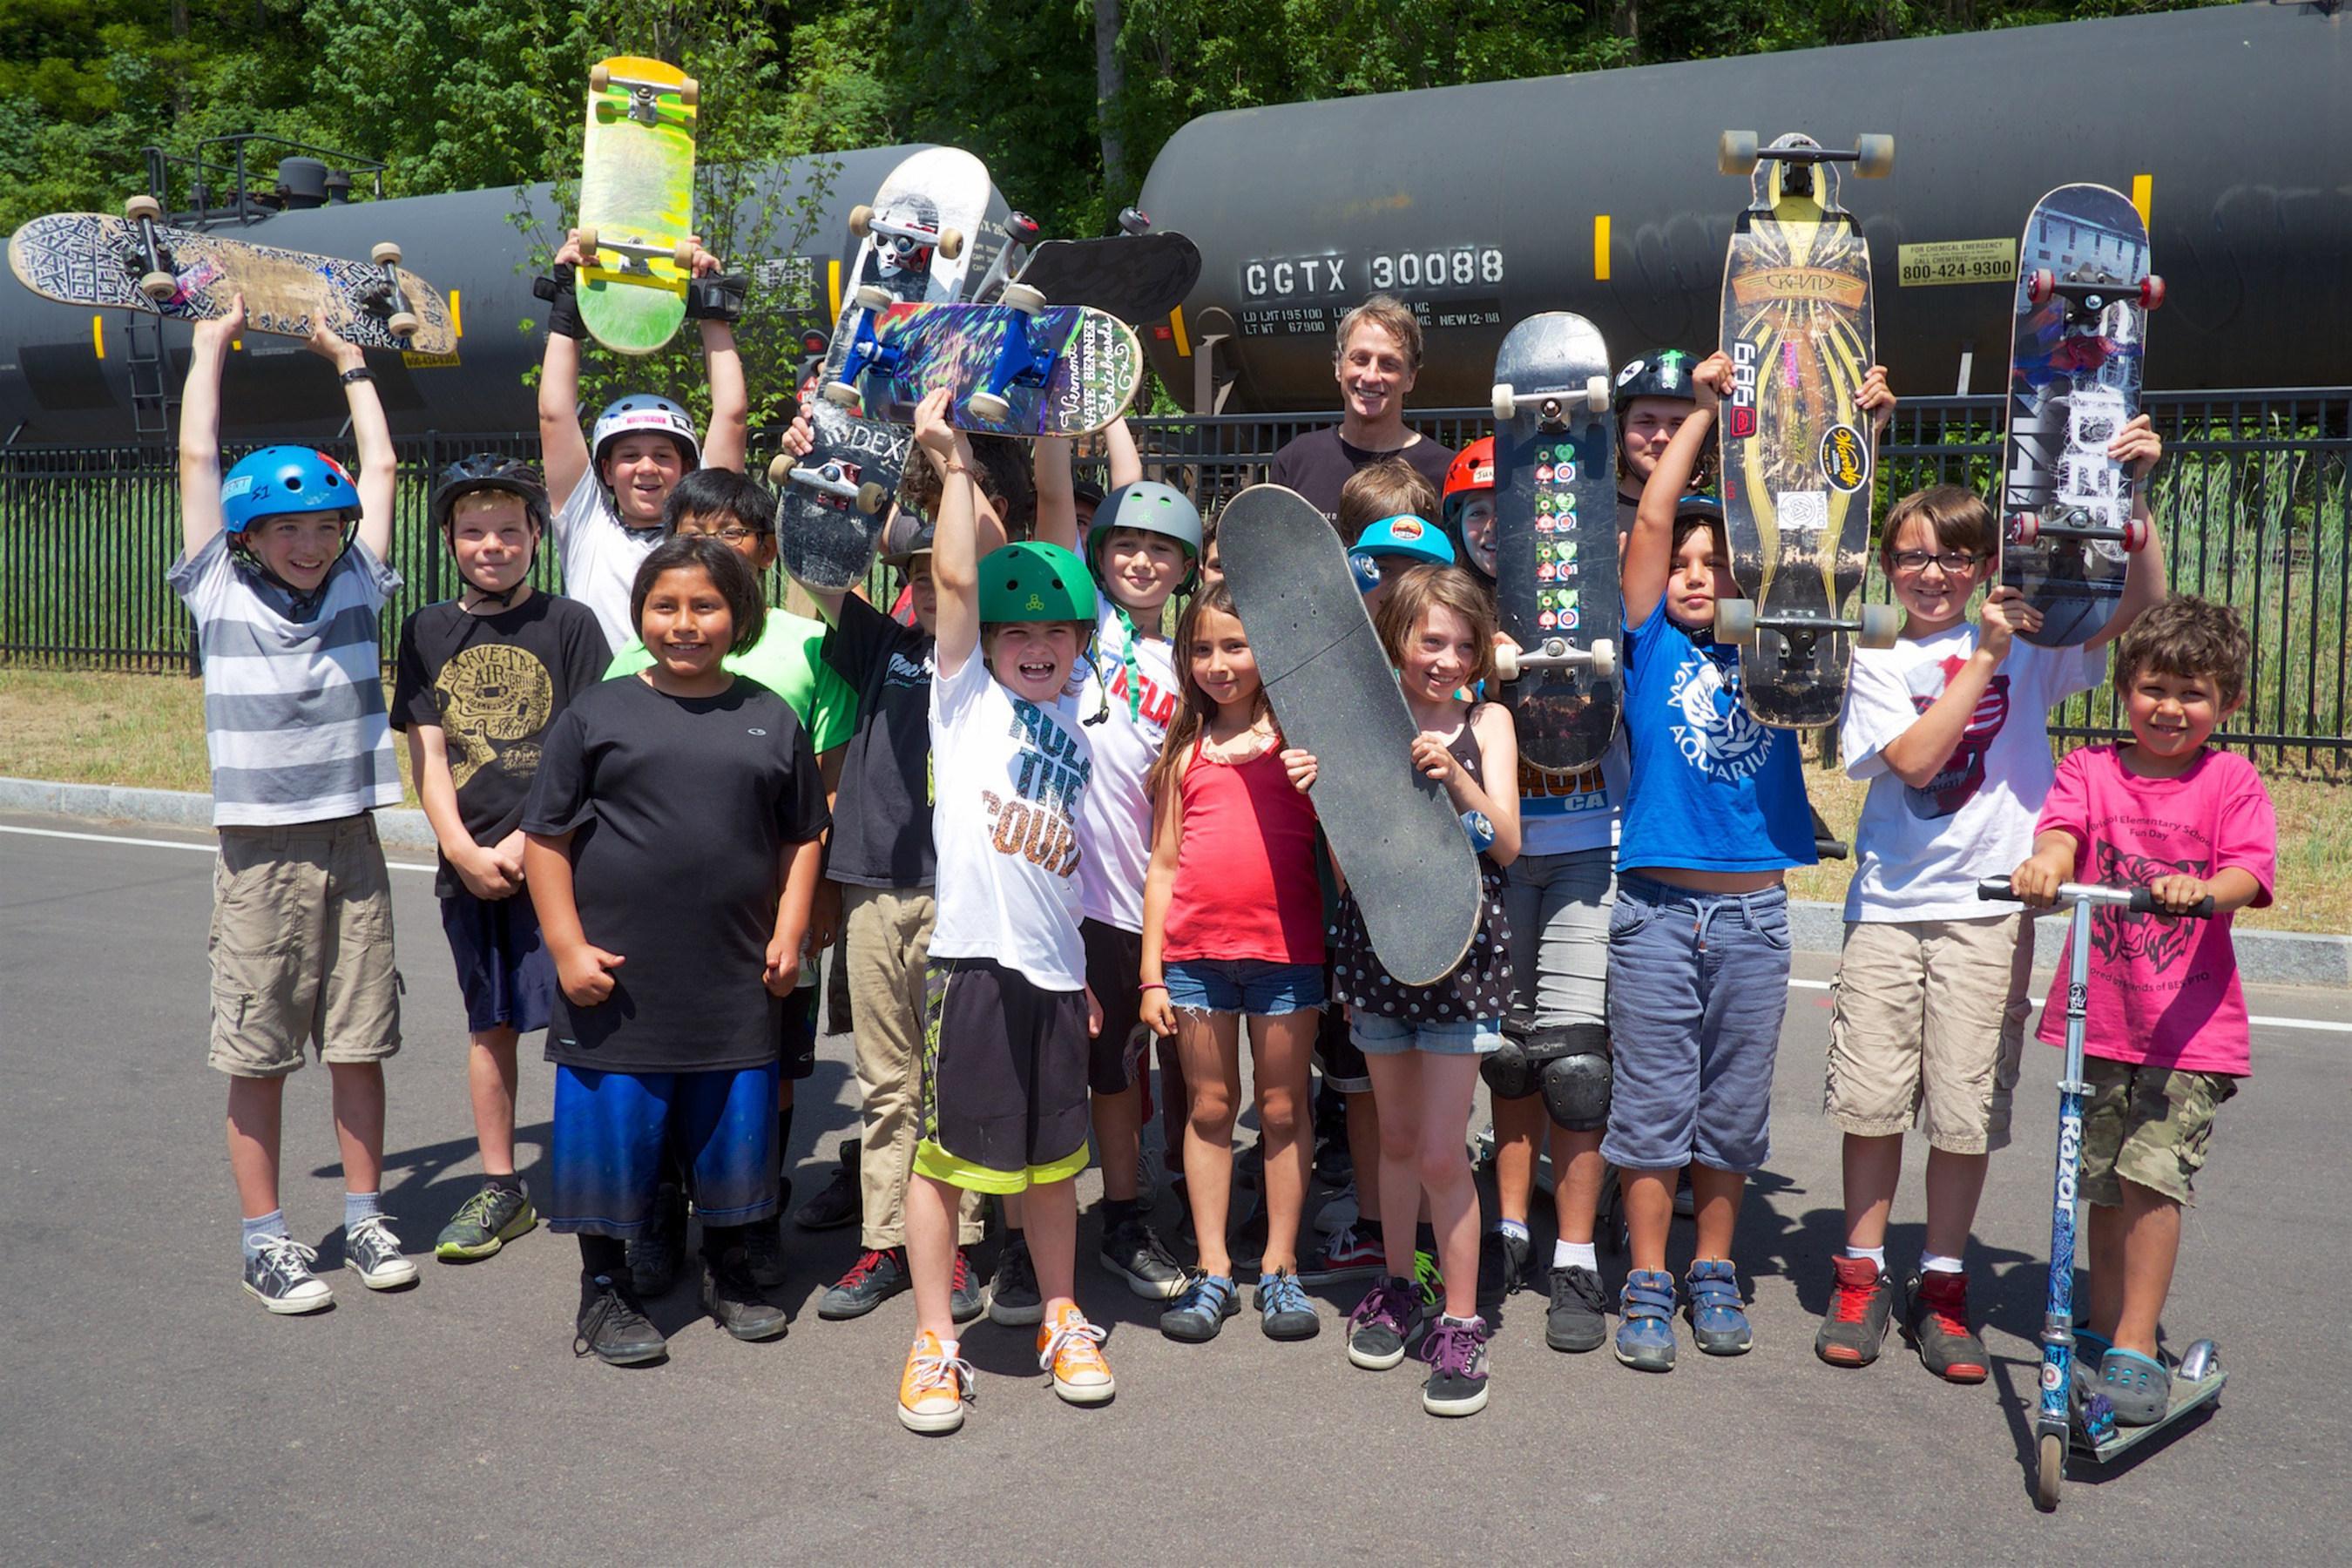 Tony Hawk Helps Celebrate 500th Skatepark